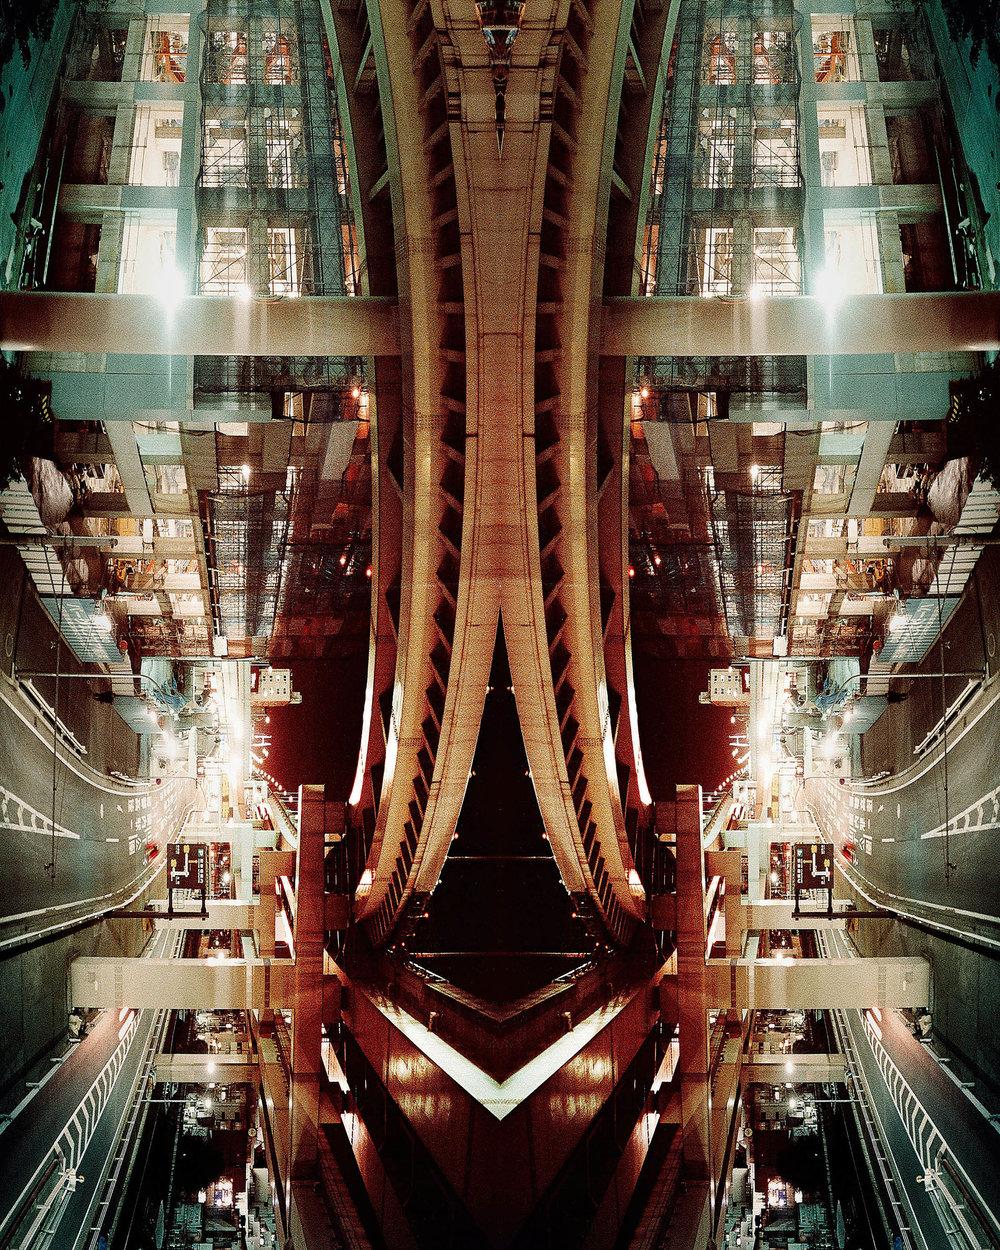 TOKYO MIRRORED - I